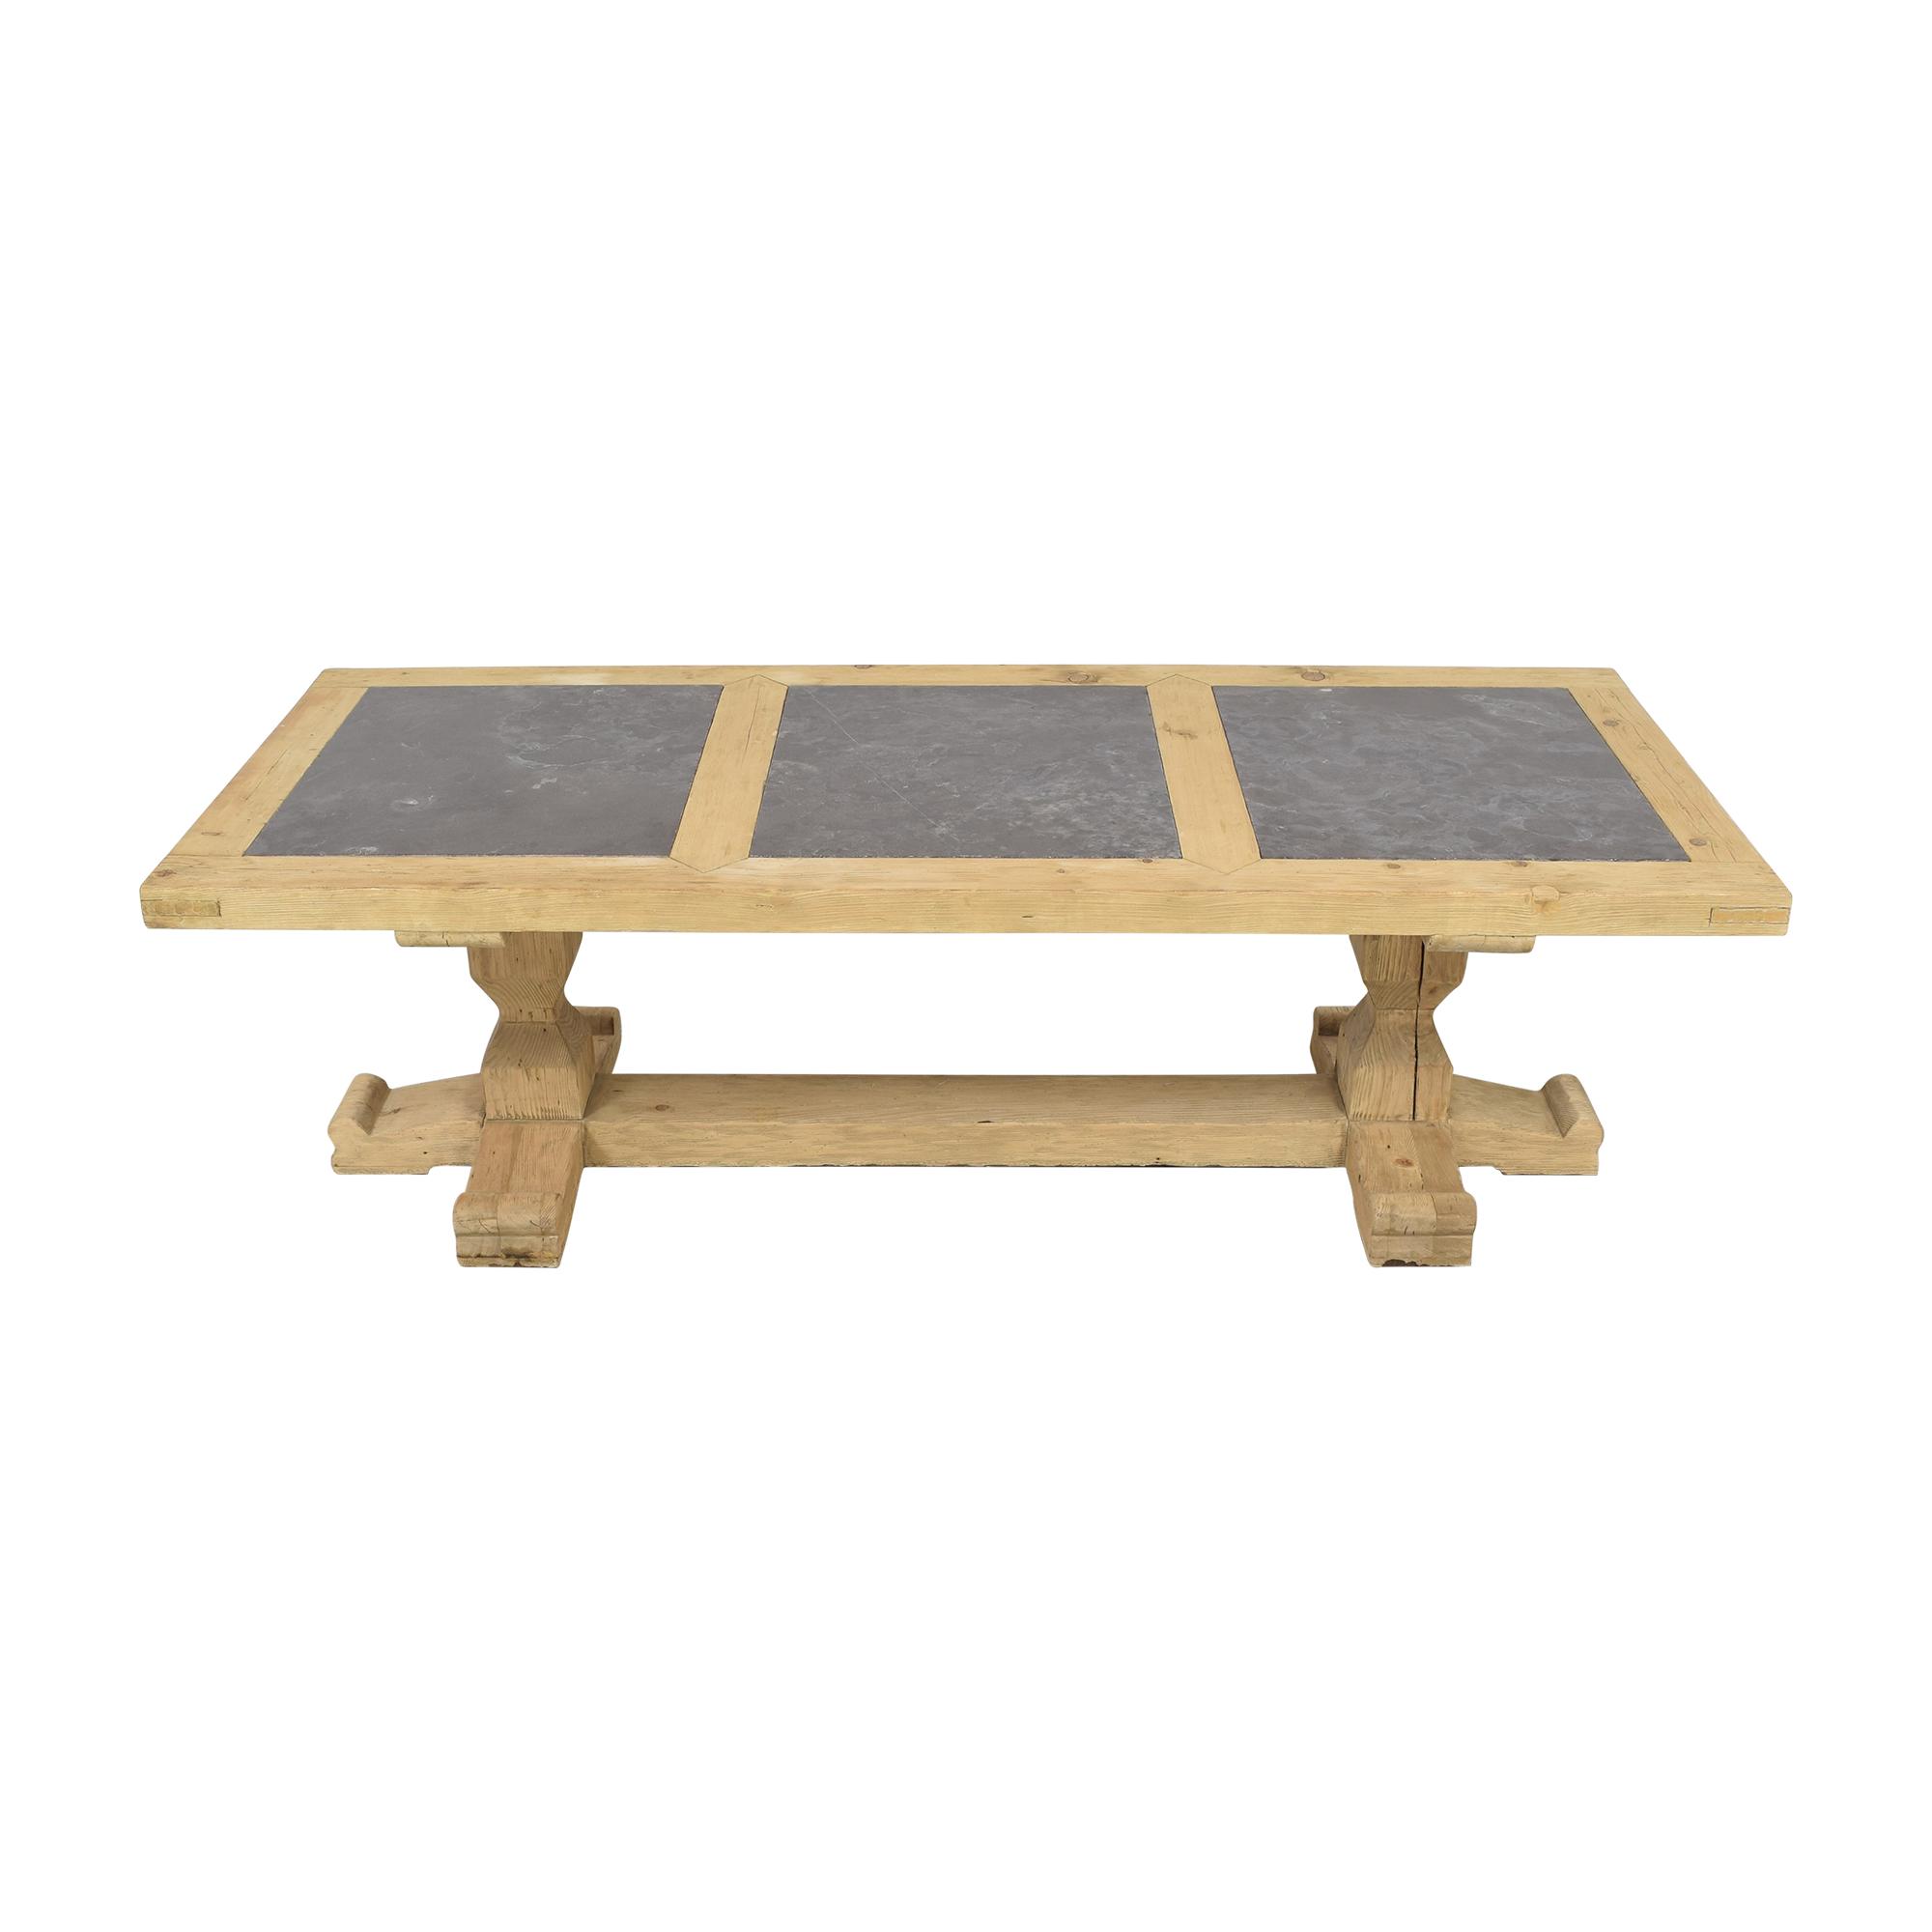 Restoration Hardware Restoration Hardware 18th C. Reclaimed Pine & Bluestone Rectangular Dining Table Tables